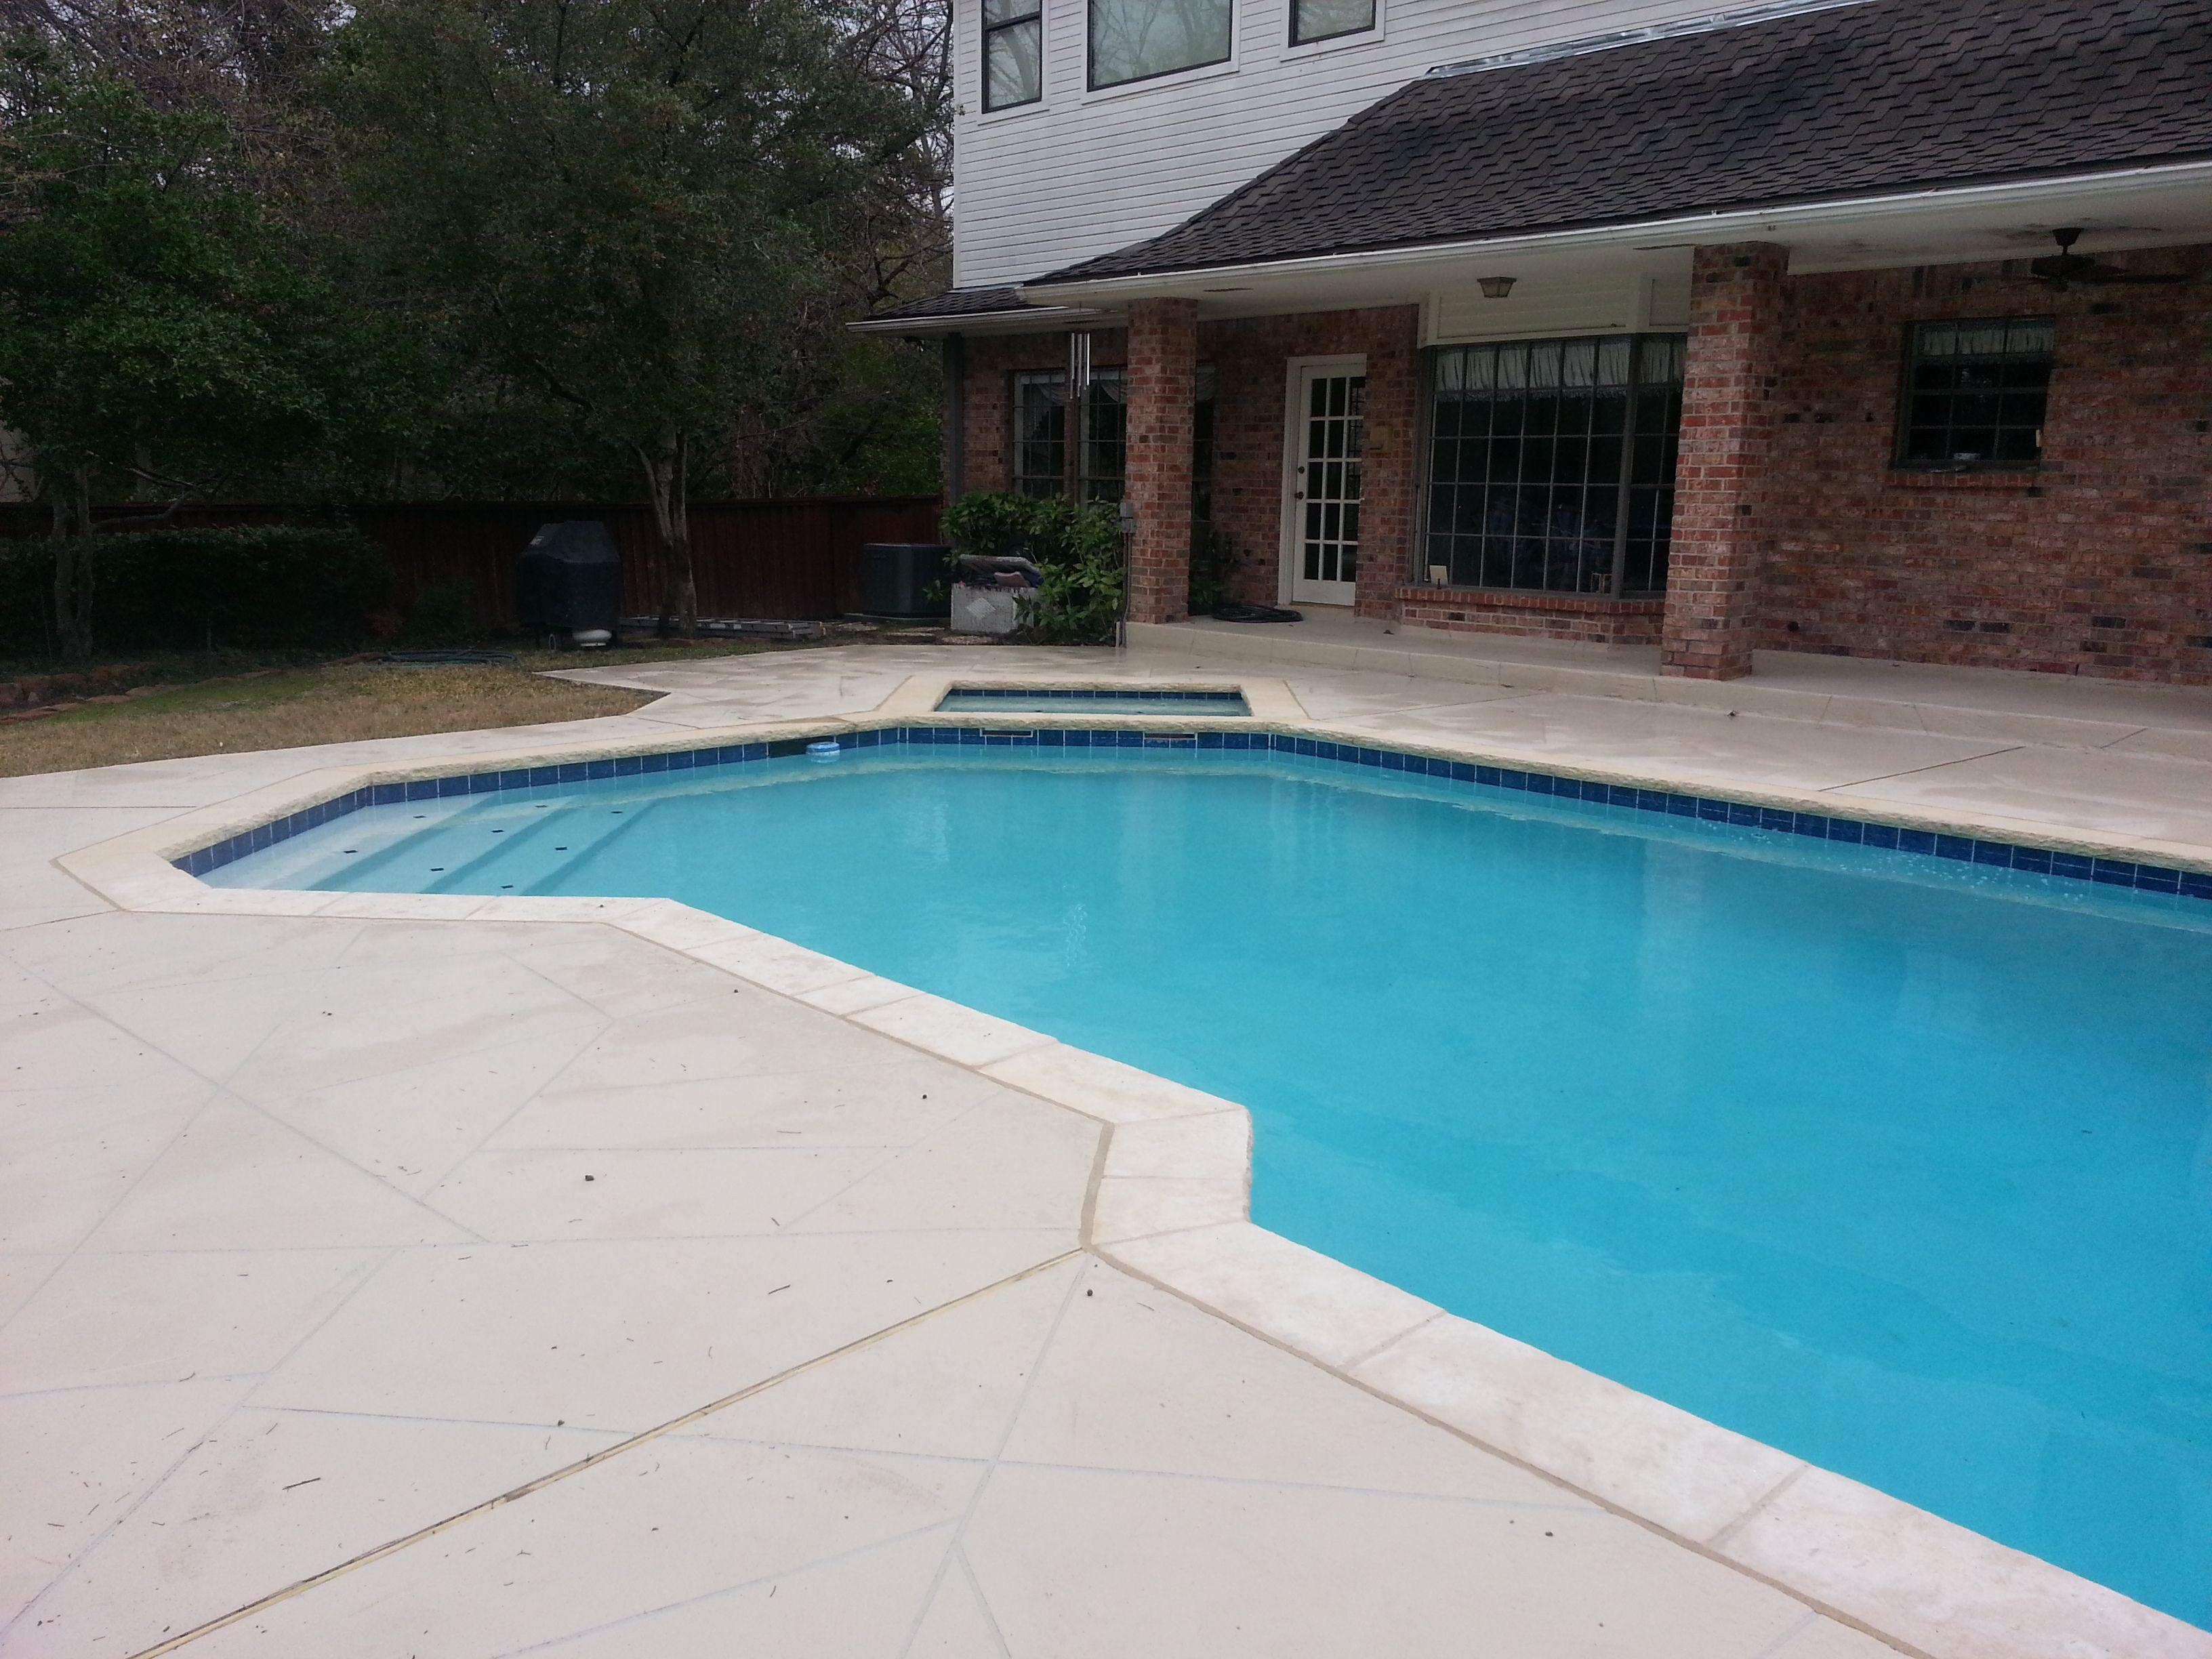 Swimming Pool Spray Deck : Astin cream coping super blue diamond brite plaster spray